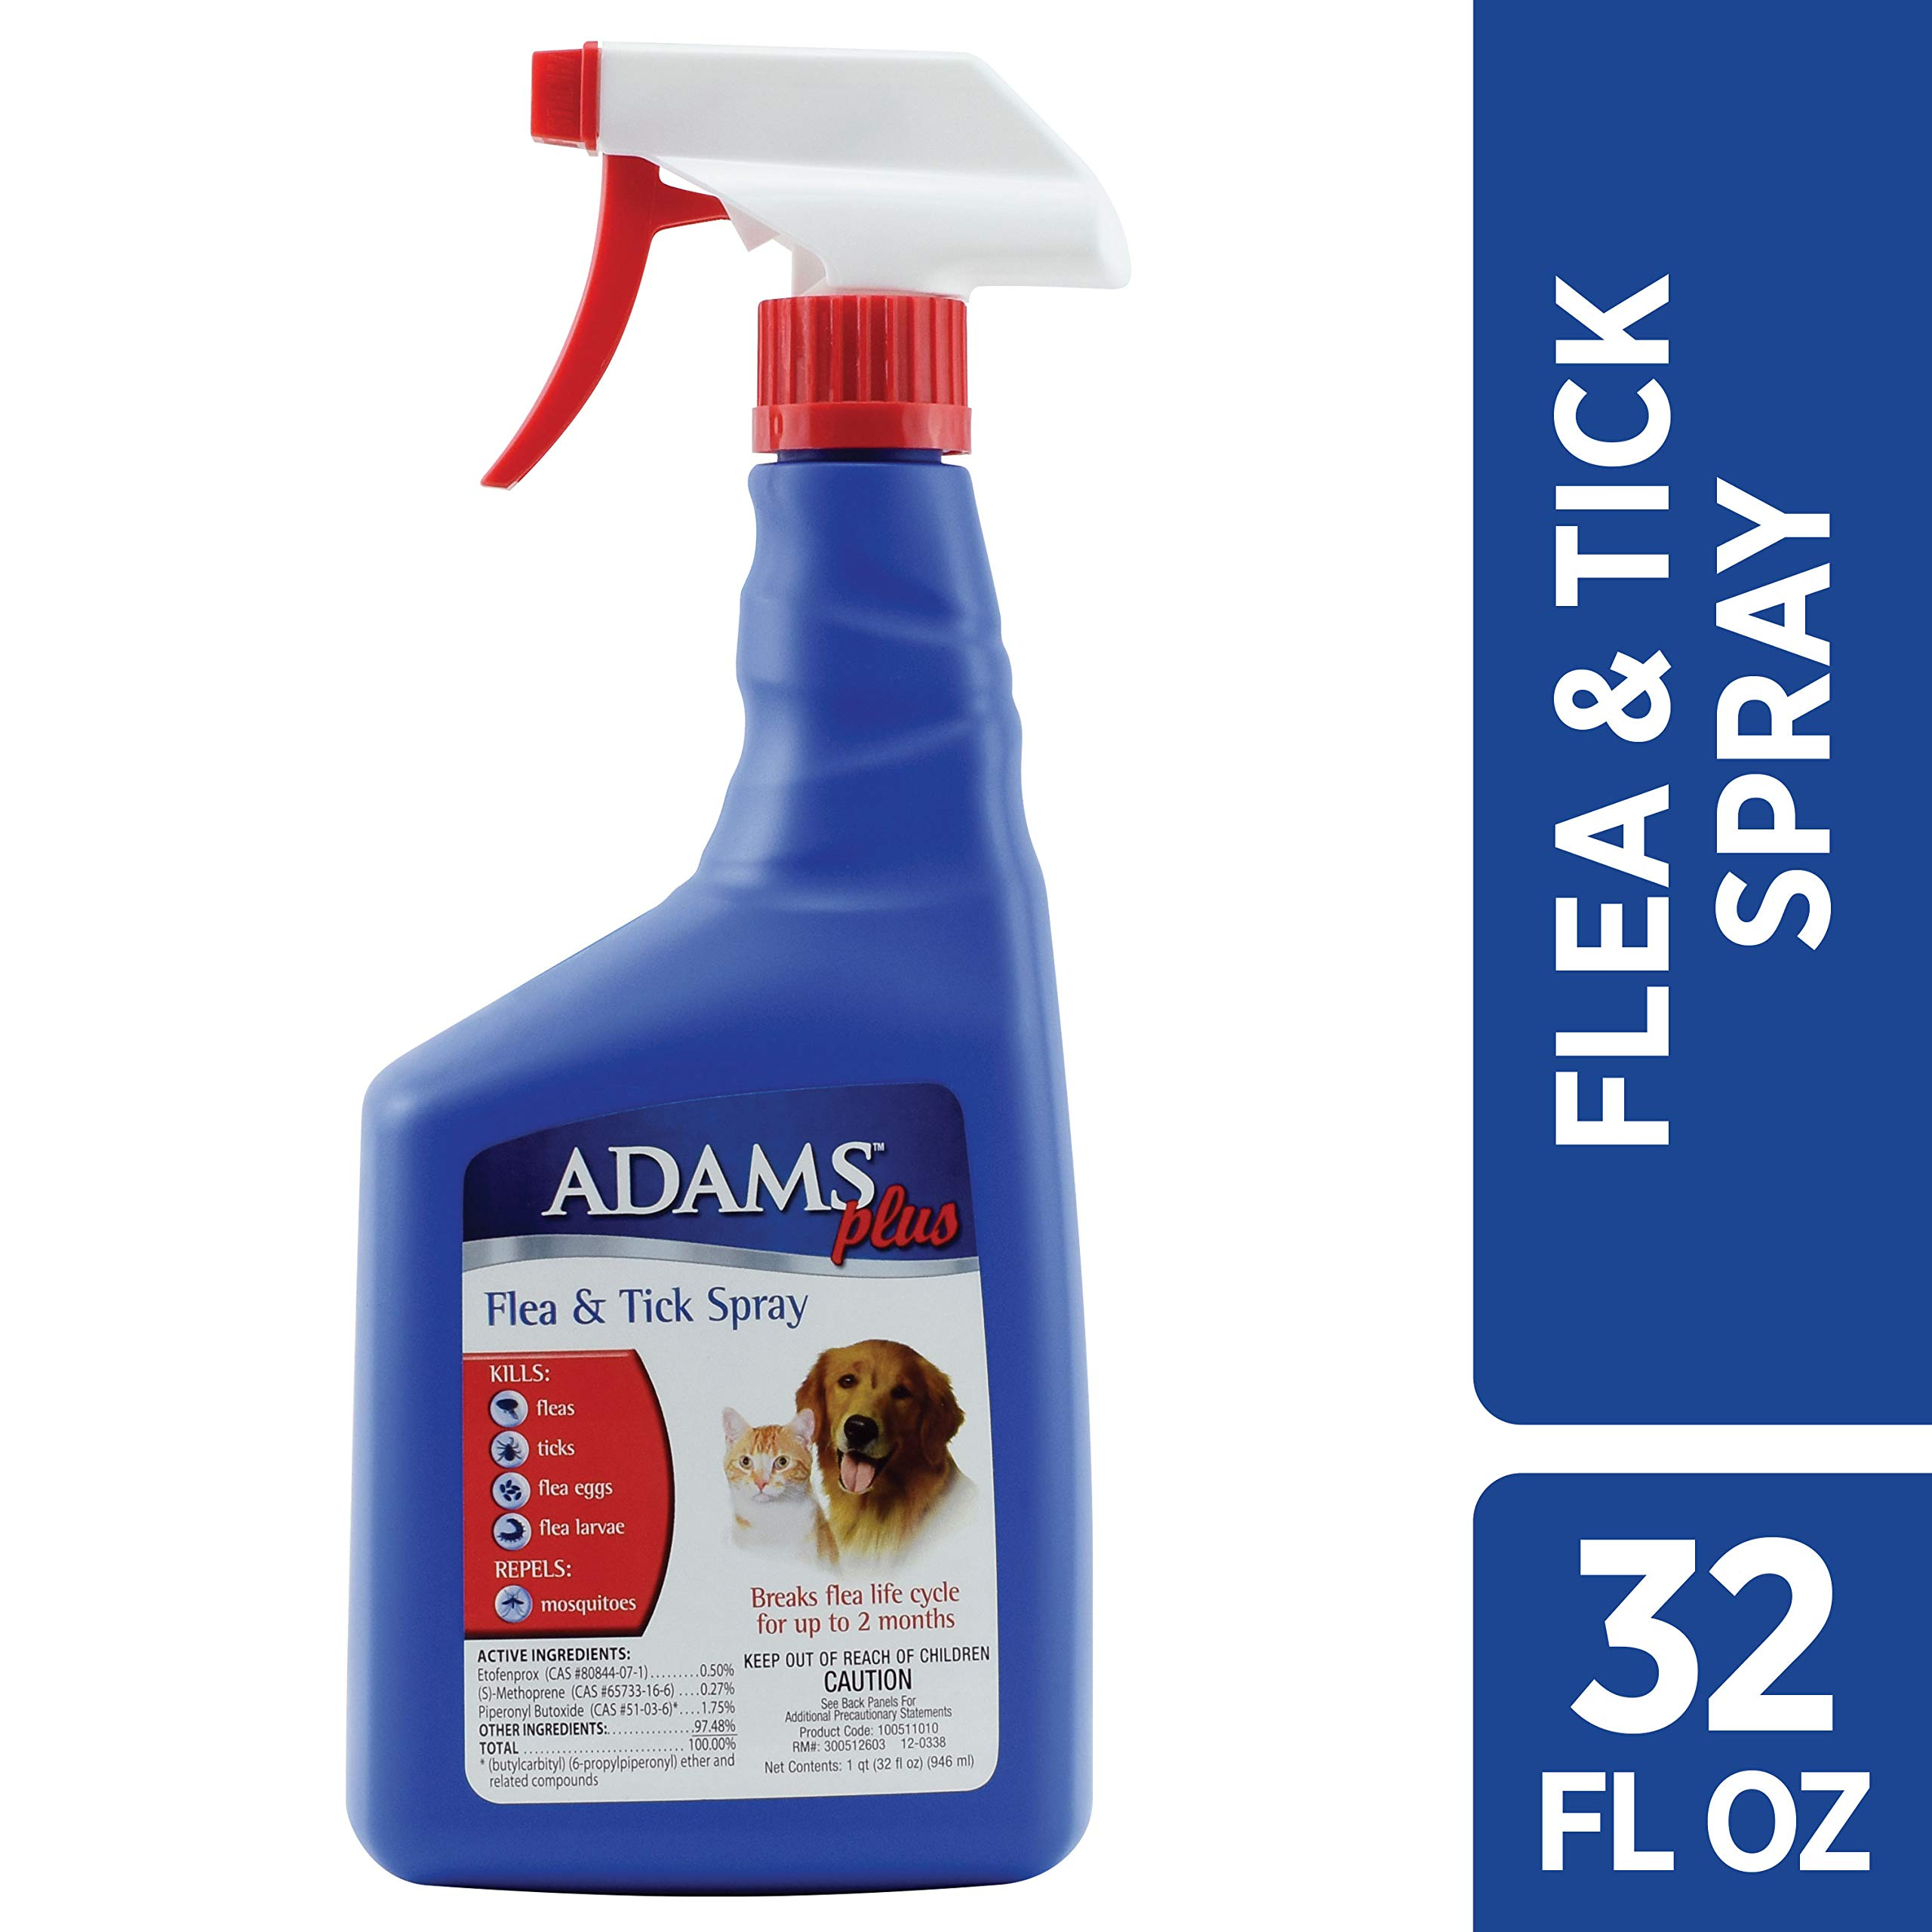 Adams Plus Flea Tick Spray